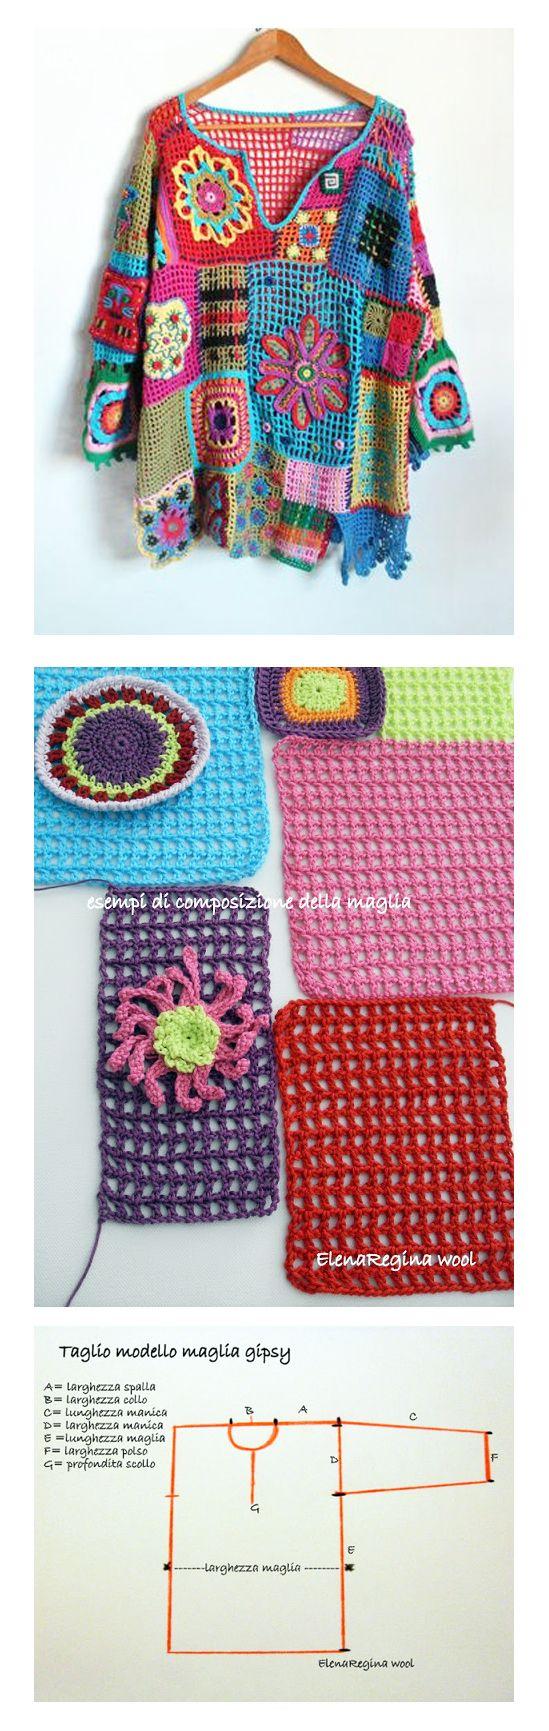 Crochet vintage sweater - similar gypsy stile -Elena Regina Wool - tutorial (ita)